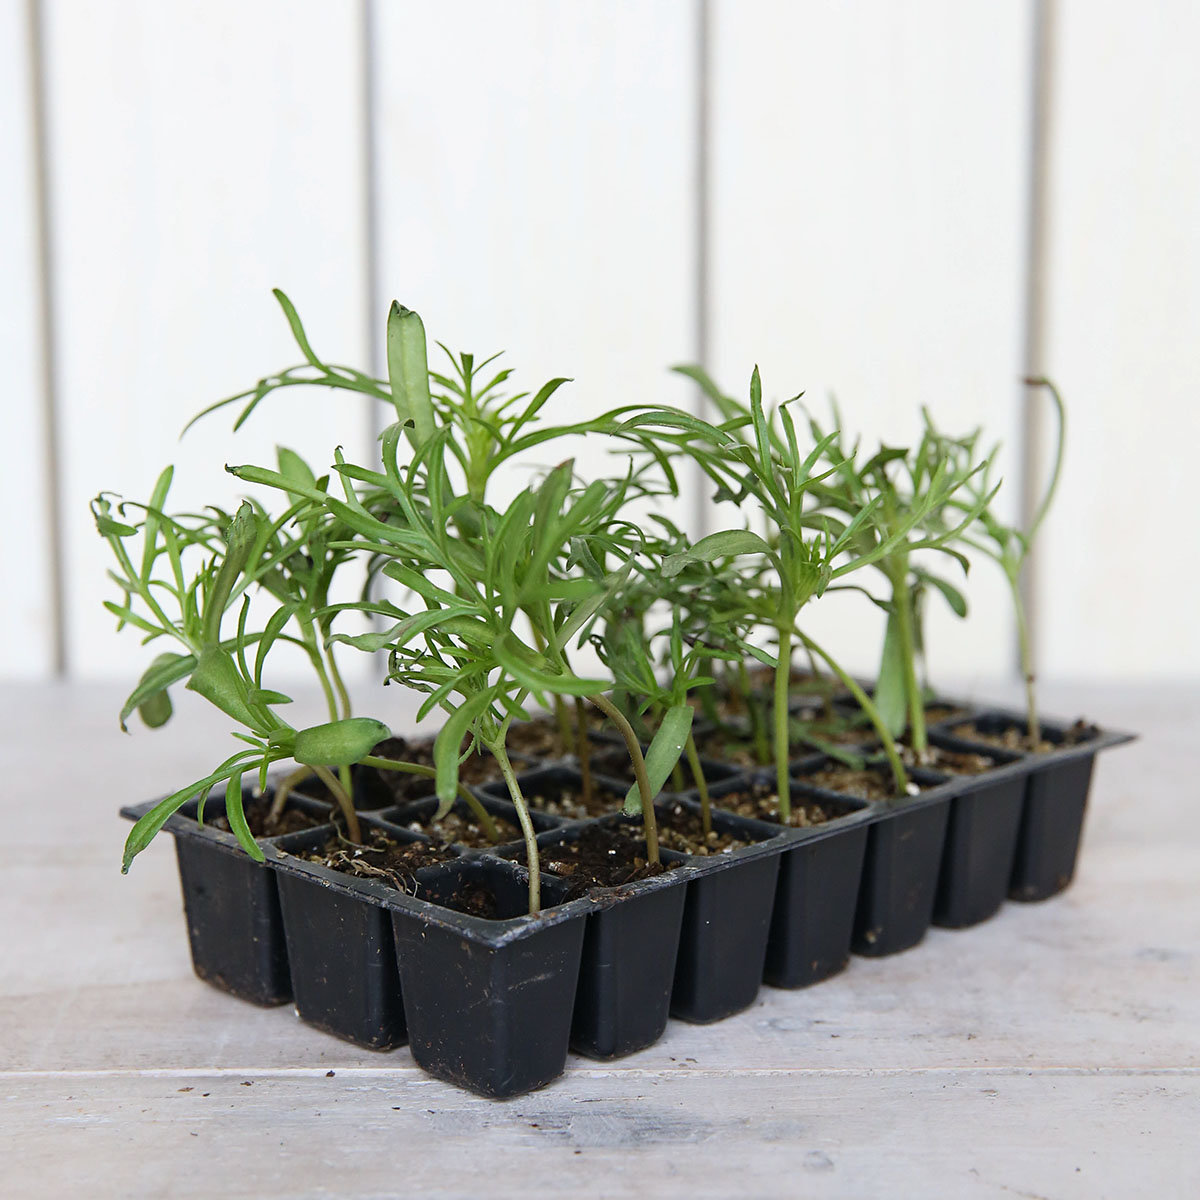 Mini-Jungpflanzen Schmuckkörbchen Sonata-Mischung | #3